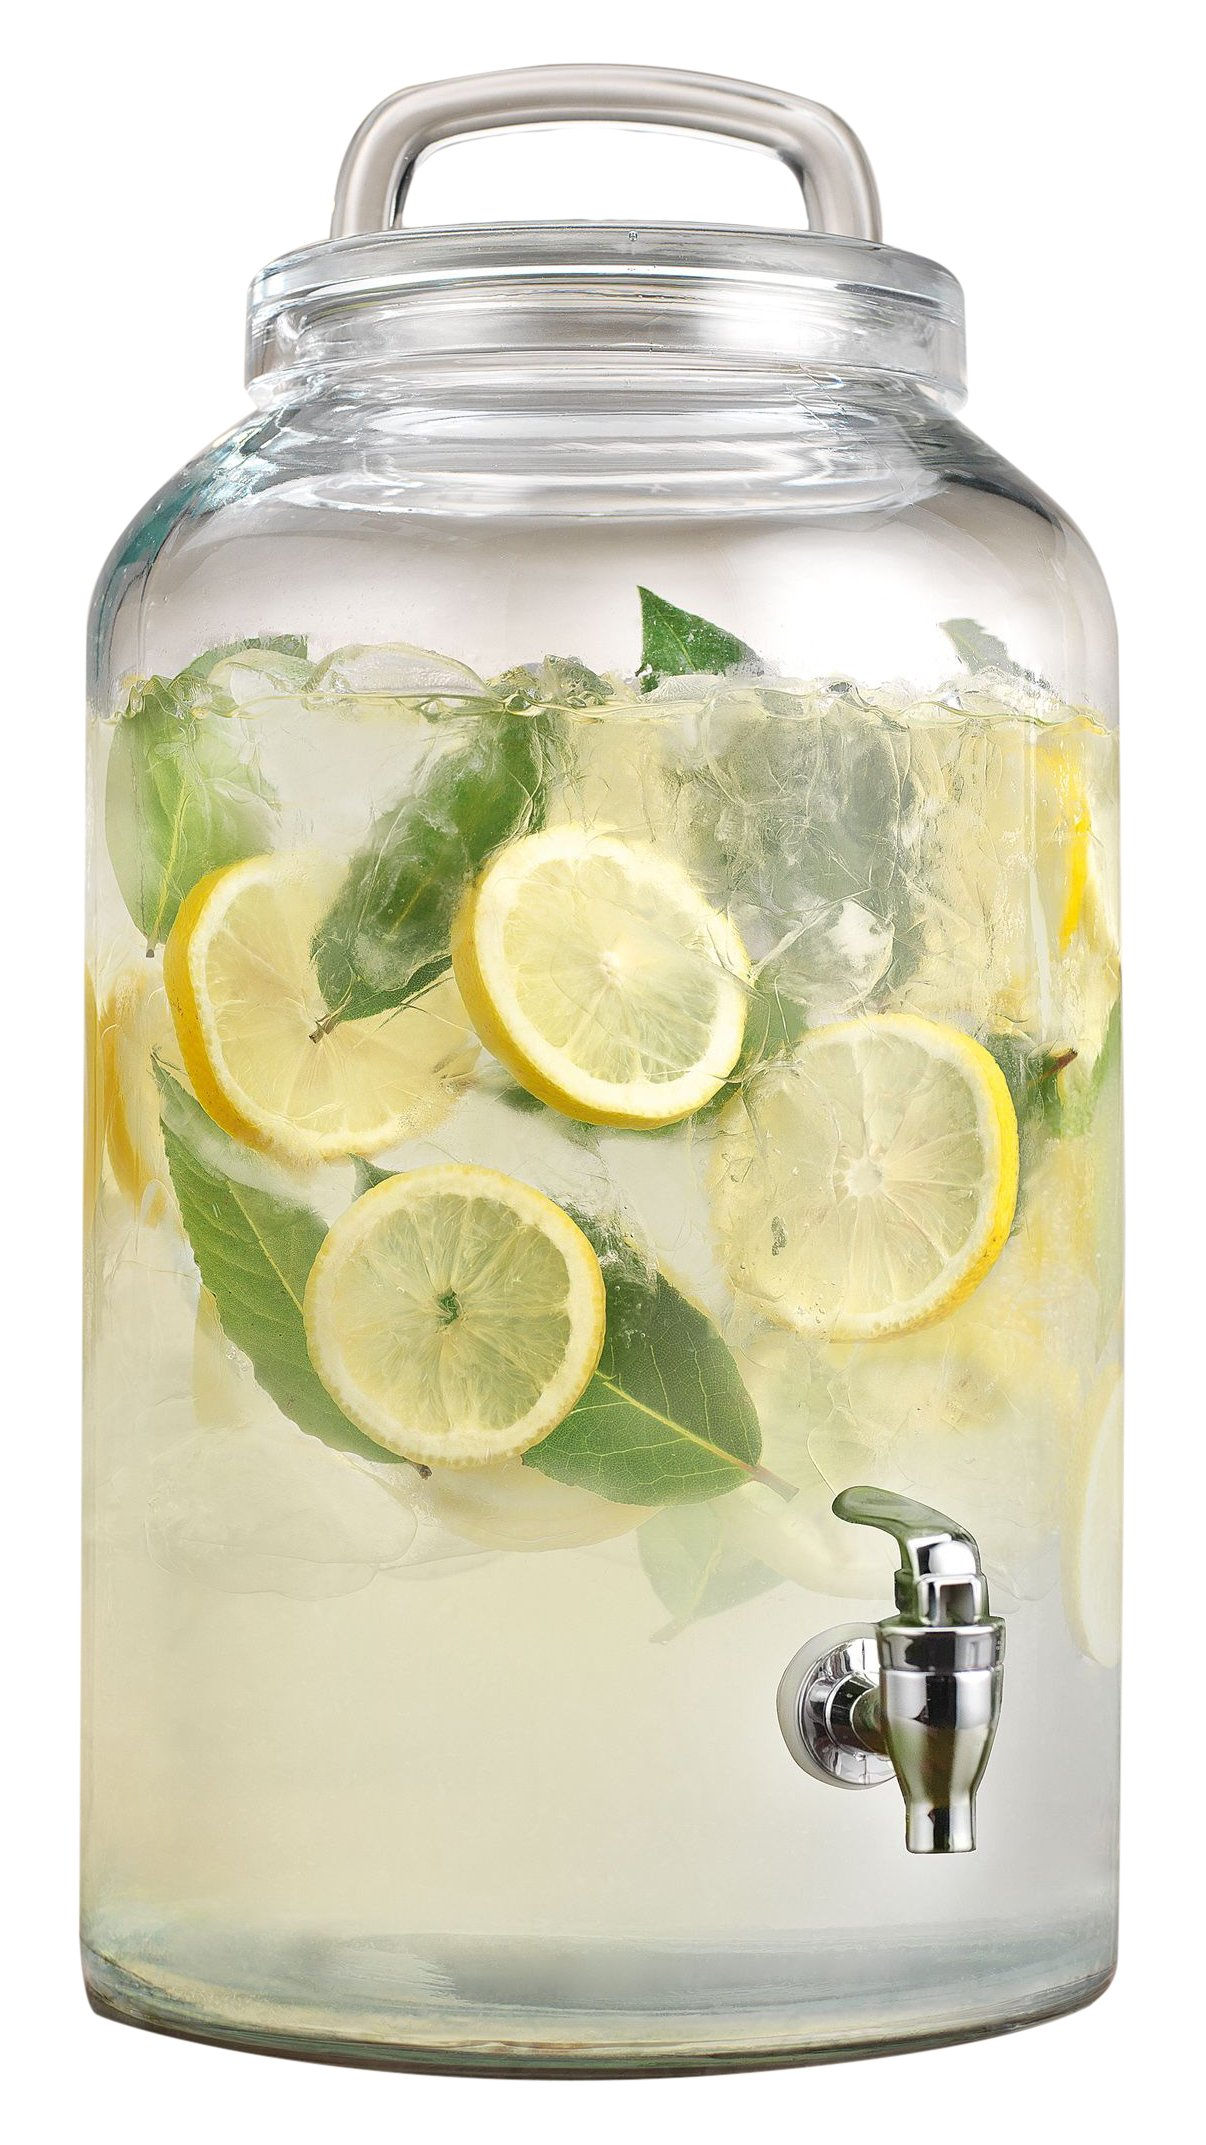 Home Essentials & Beyond 2.25 gallon Heritage Loop Lid Beverage Dispenser, Clear